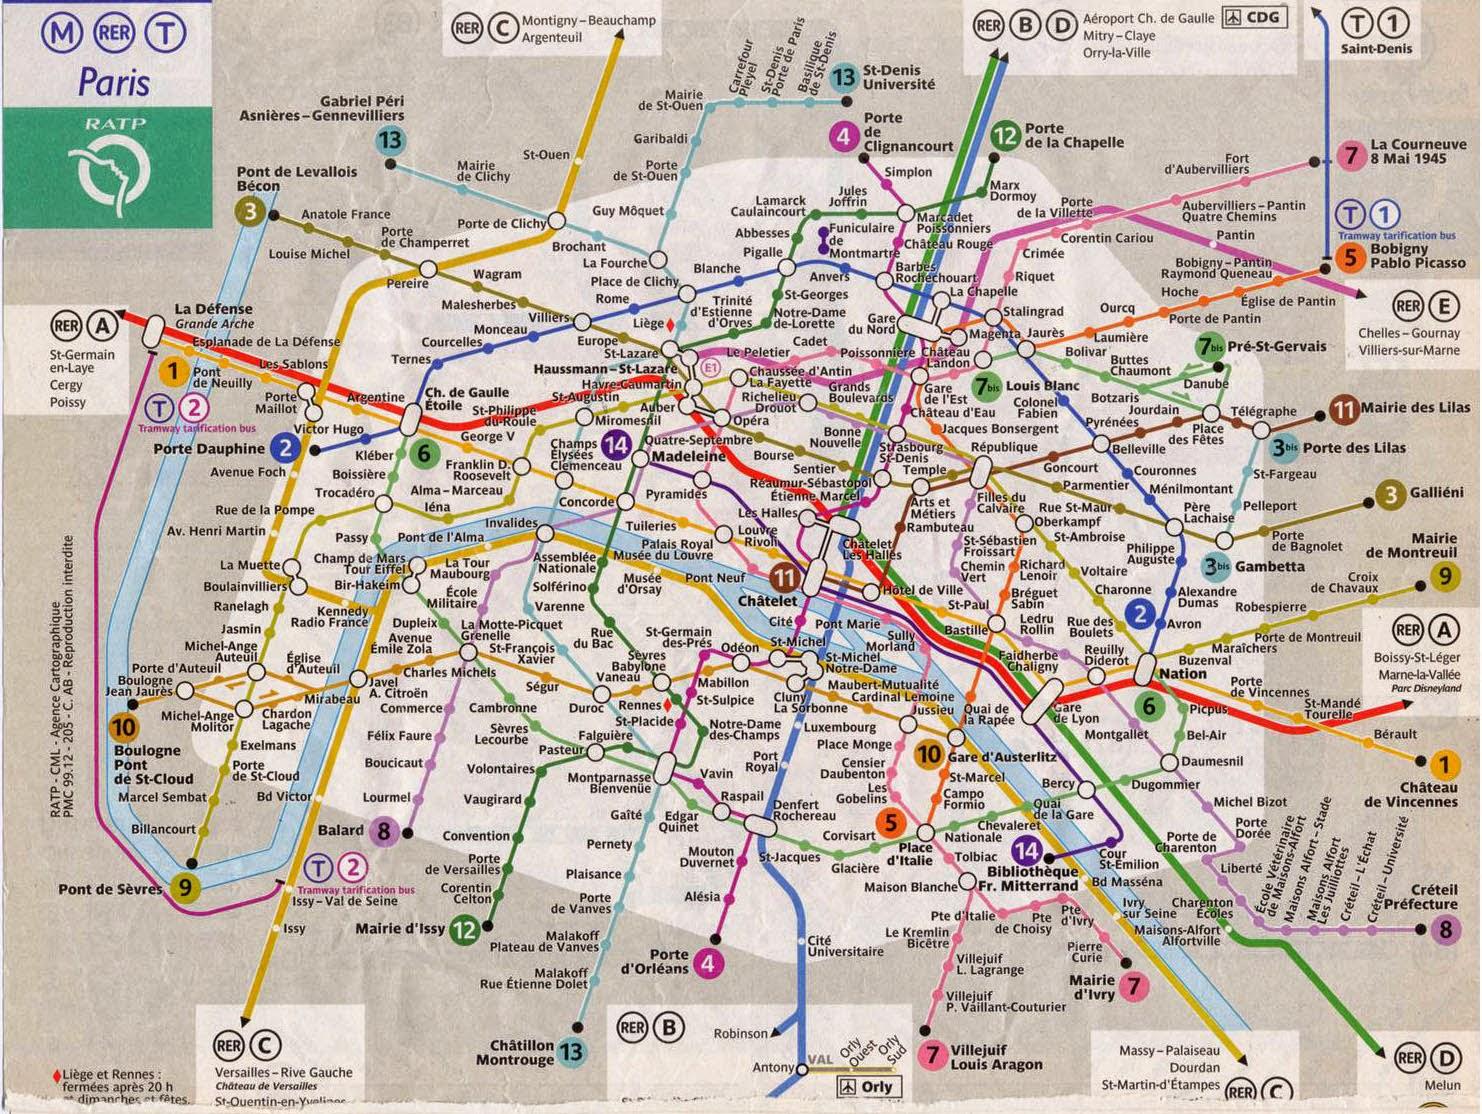 Transporte Publico Paris Mapa - Paris mapa